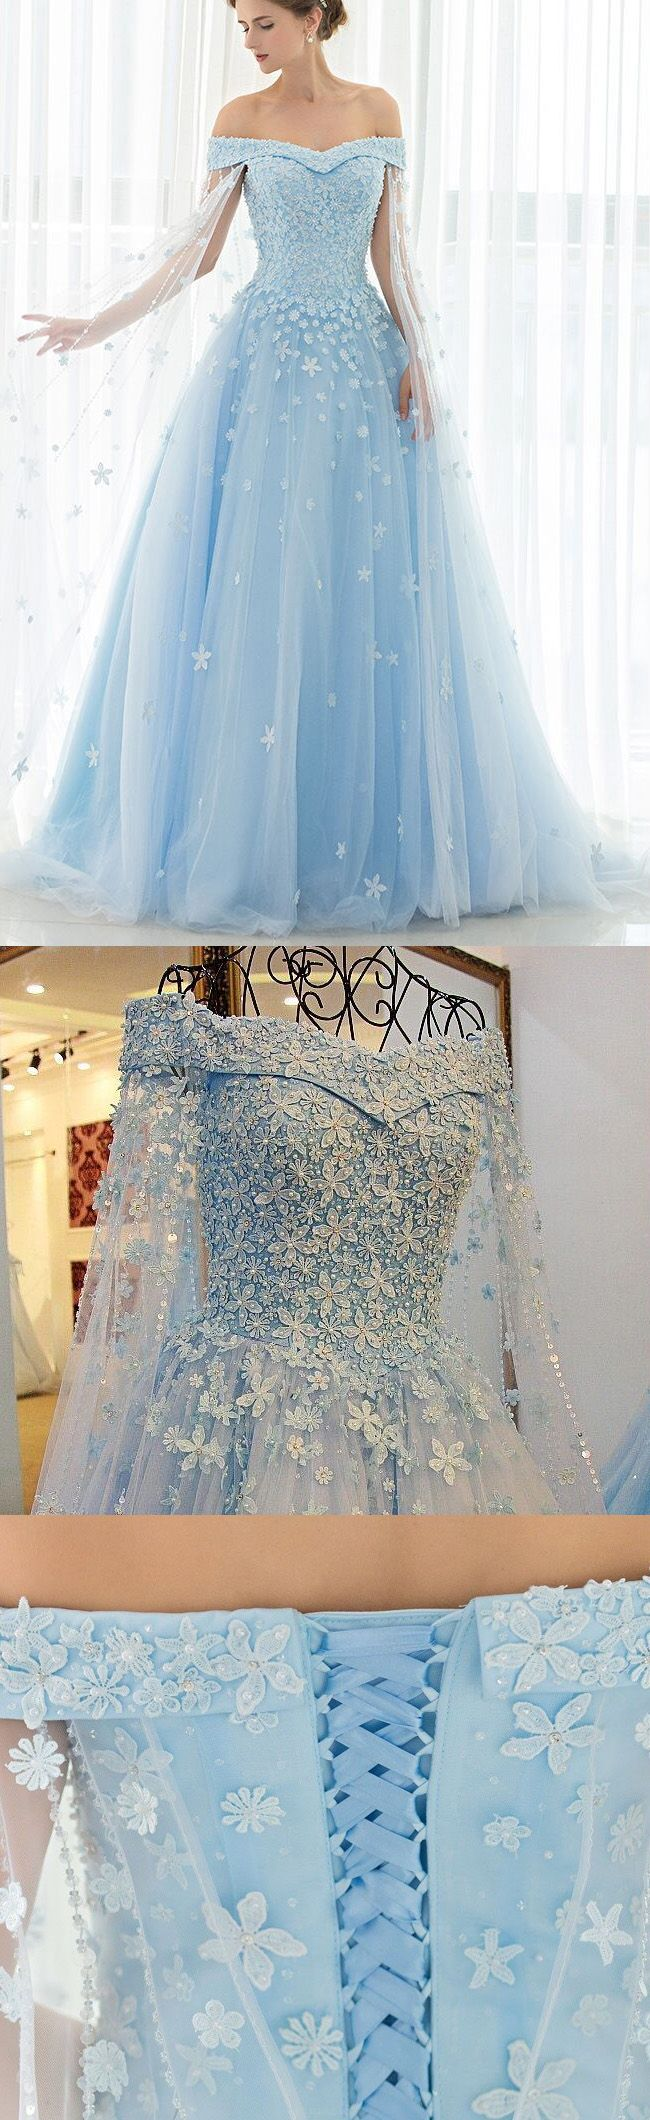 Hot sale alineprincess prom evening dresses long light blue